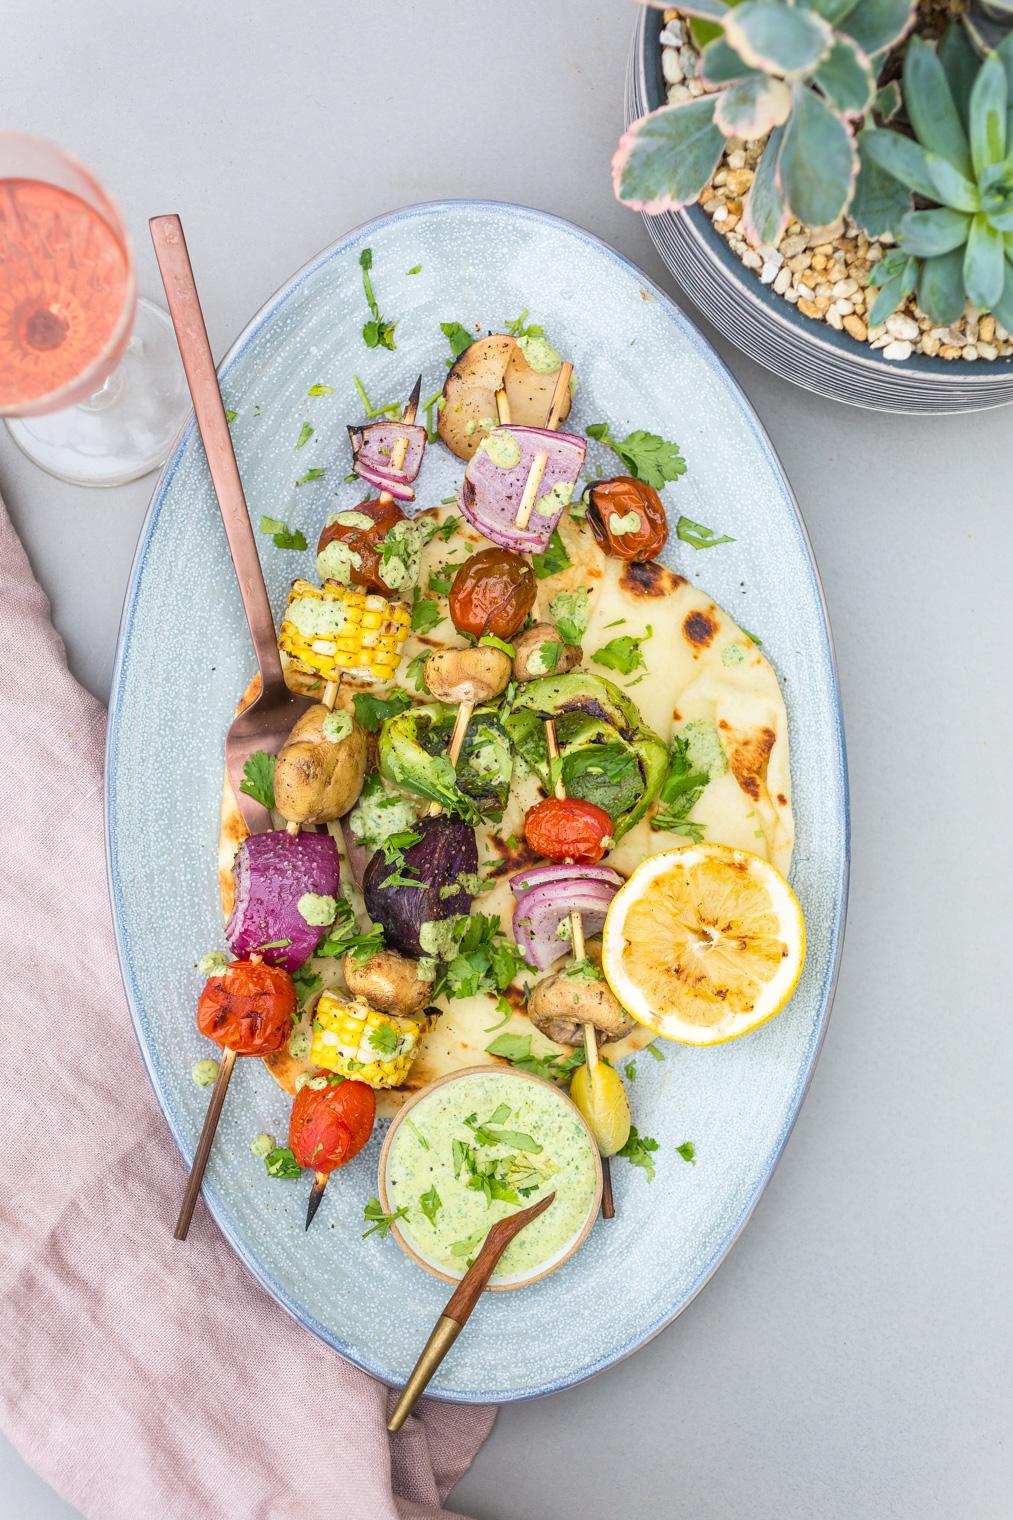 Grilled Veggies with Cilantro Yogurt Sauce & Grilled Pita